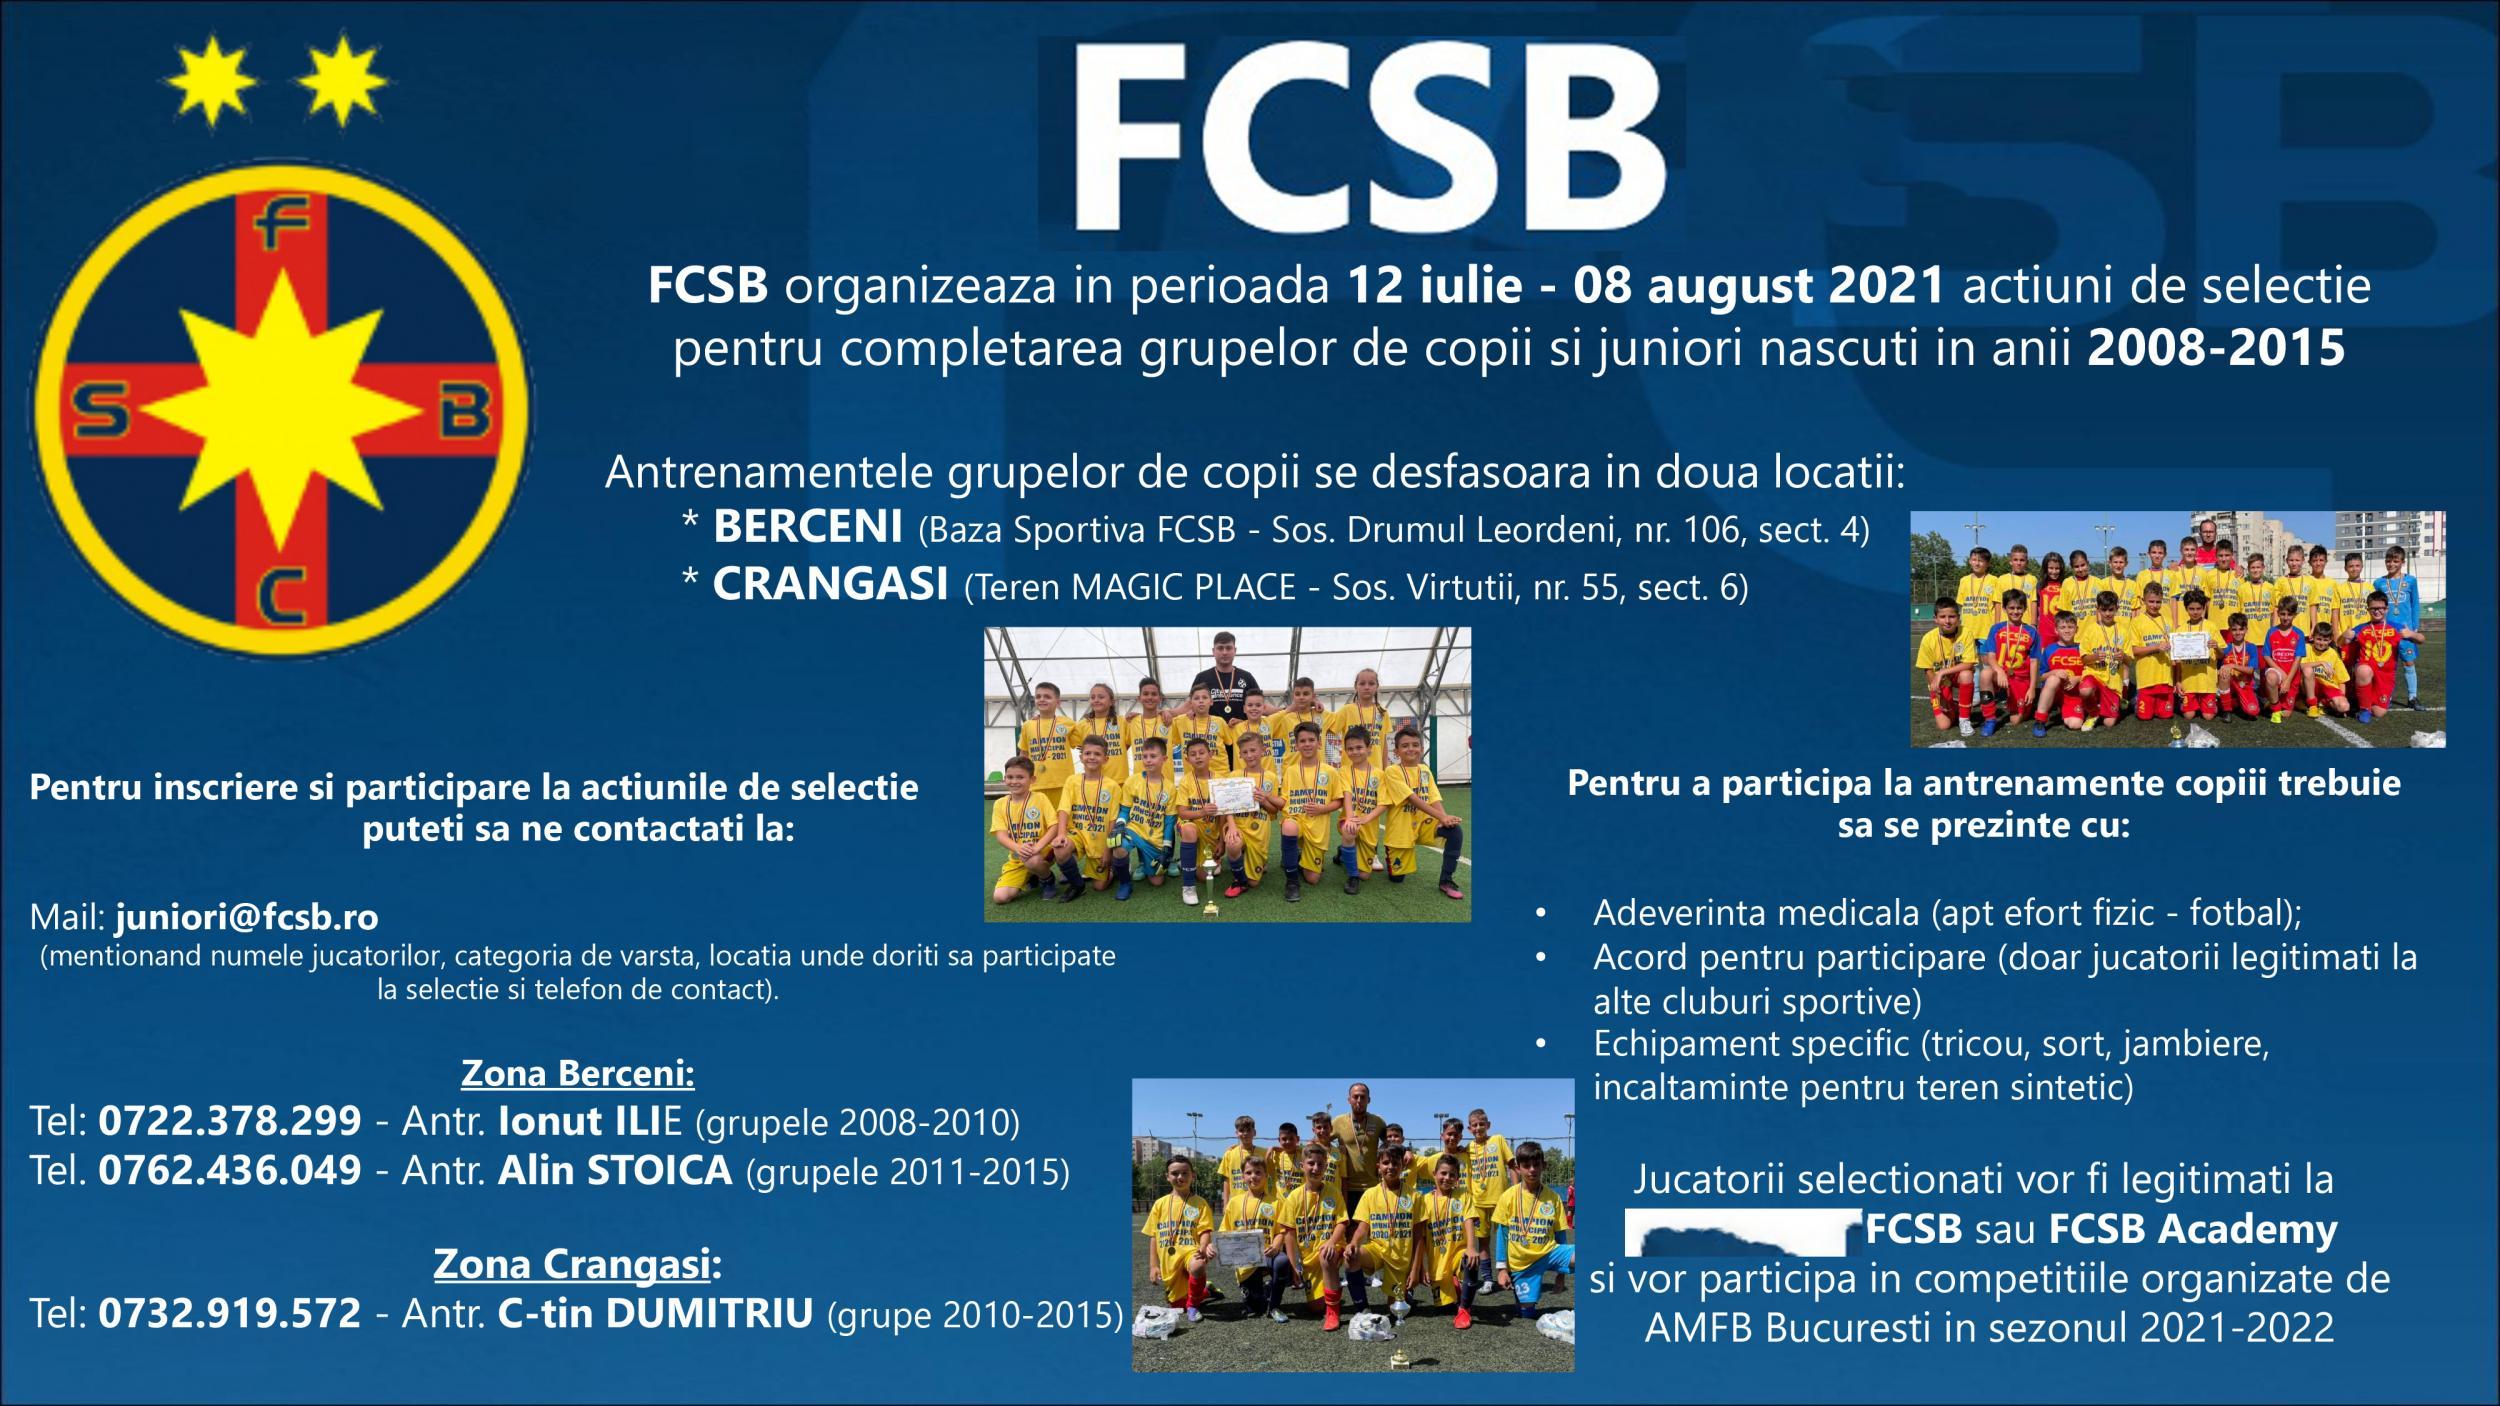 Selecție la FCSB și FCSB Academy!>